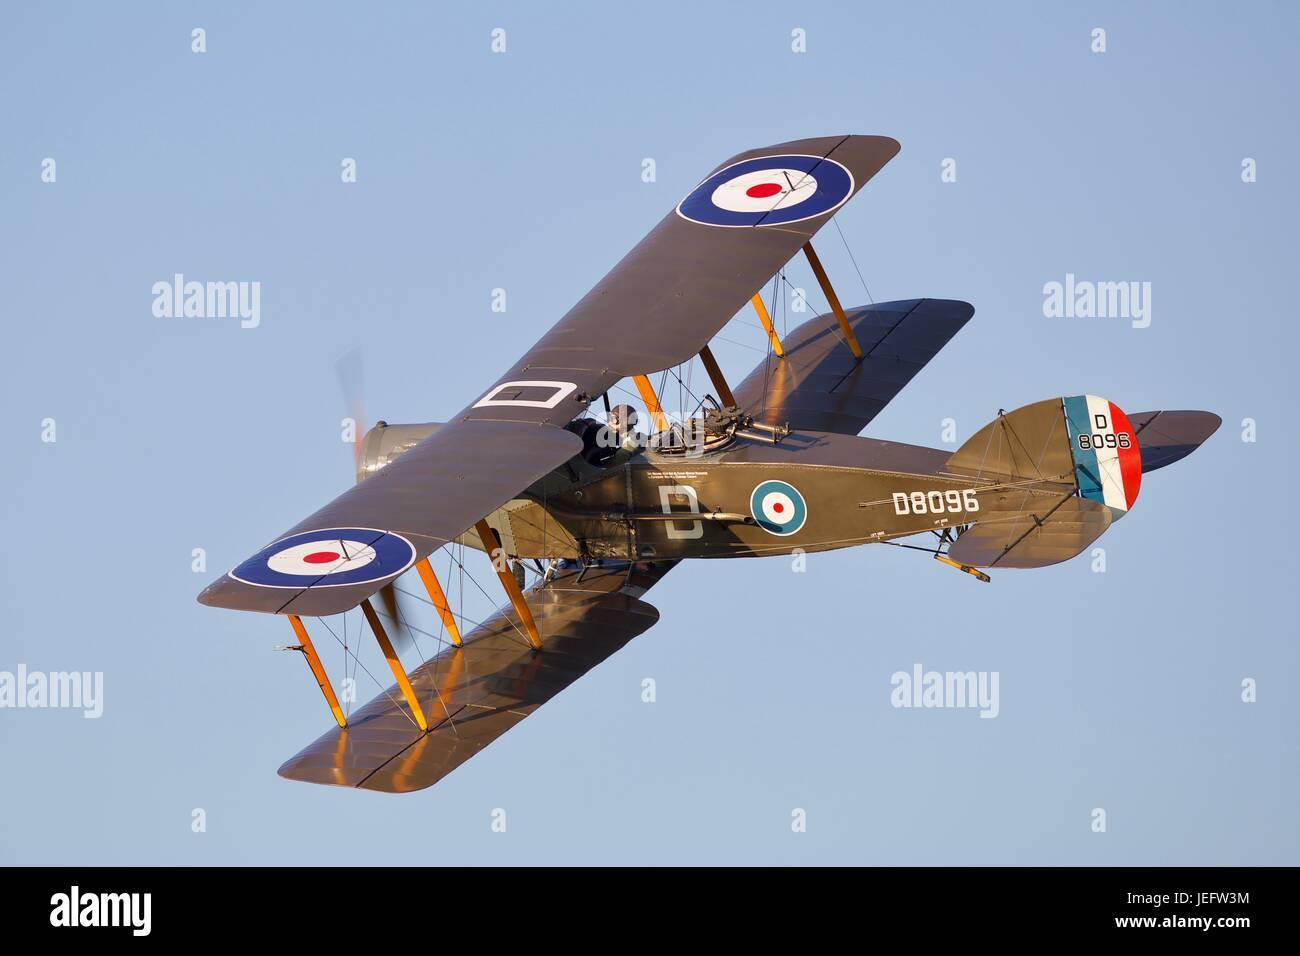 World War 1 Bristol F.2B Fighter flying at Old Warden Aerodrome - Stock Image